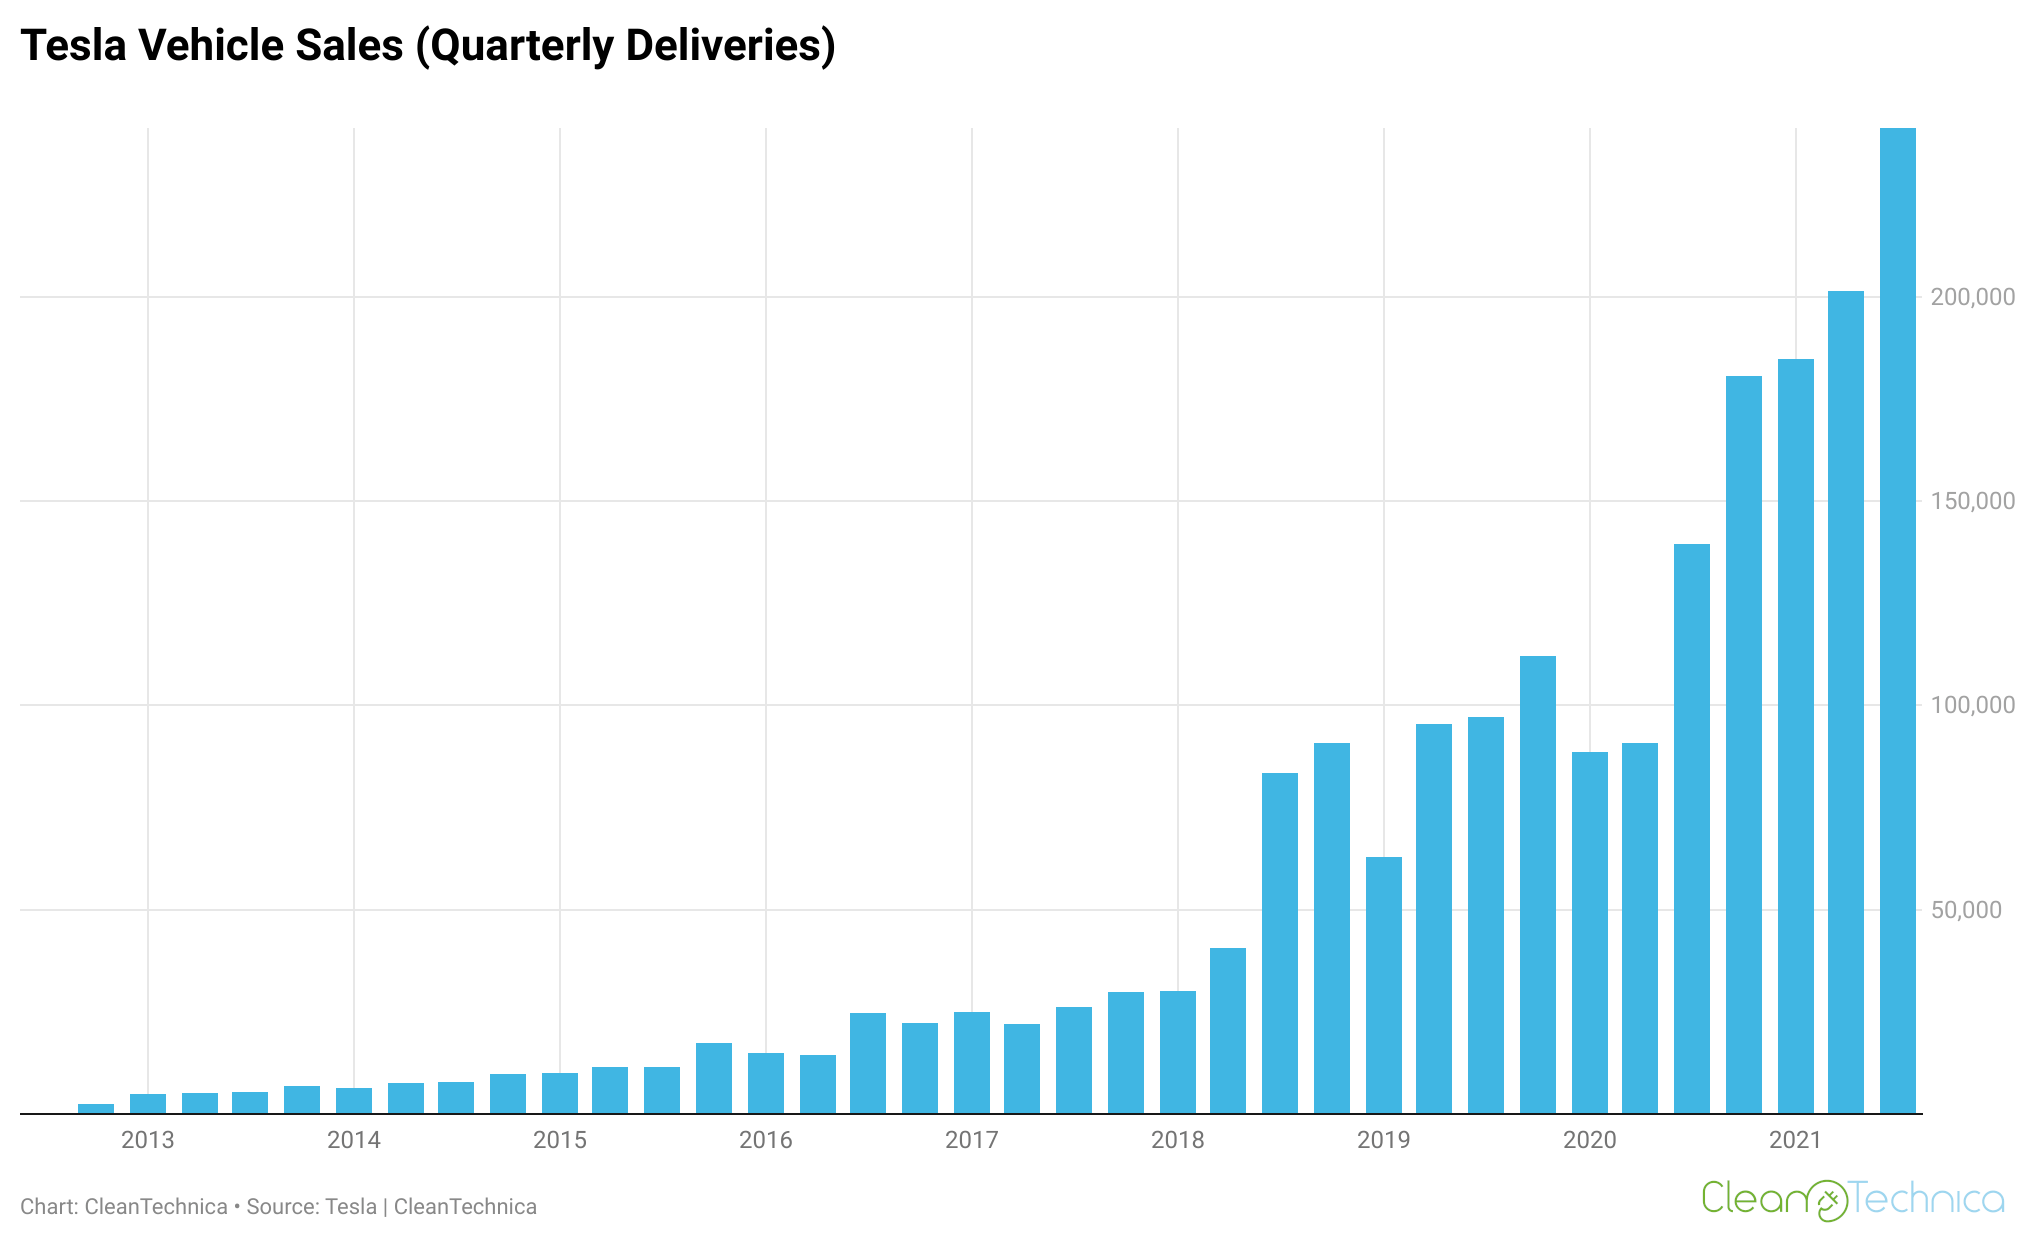 Chart-Tesla-vehicle-sales-quarterly-deliveries-CleanTechnica-logo